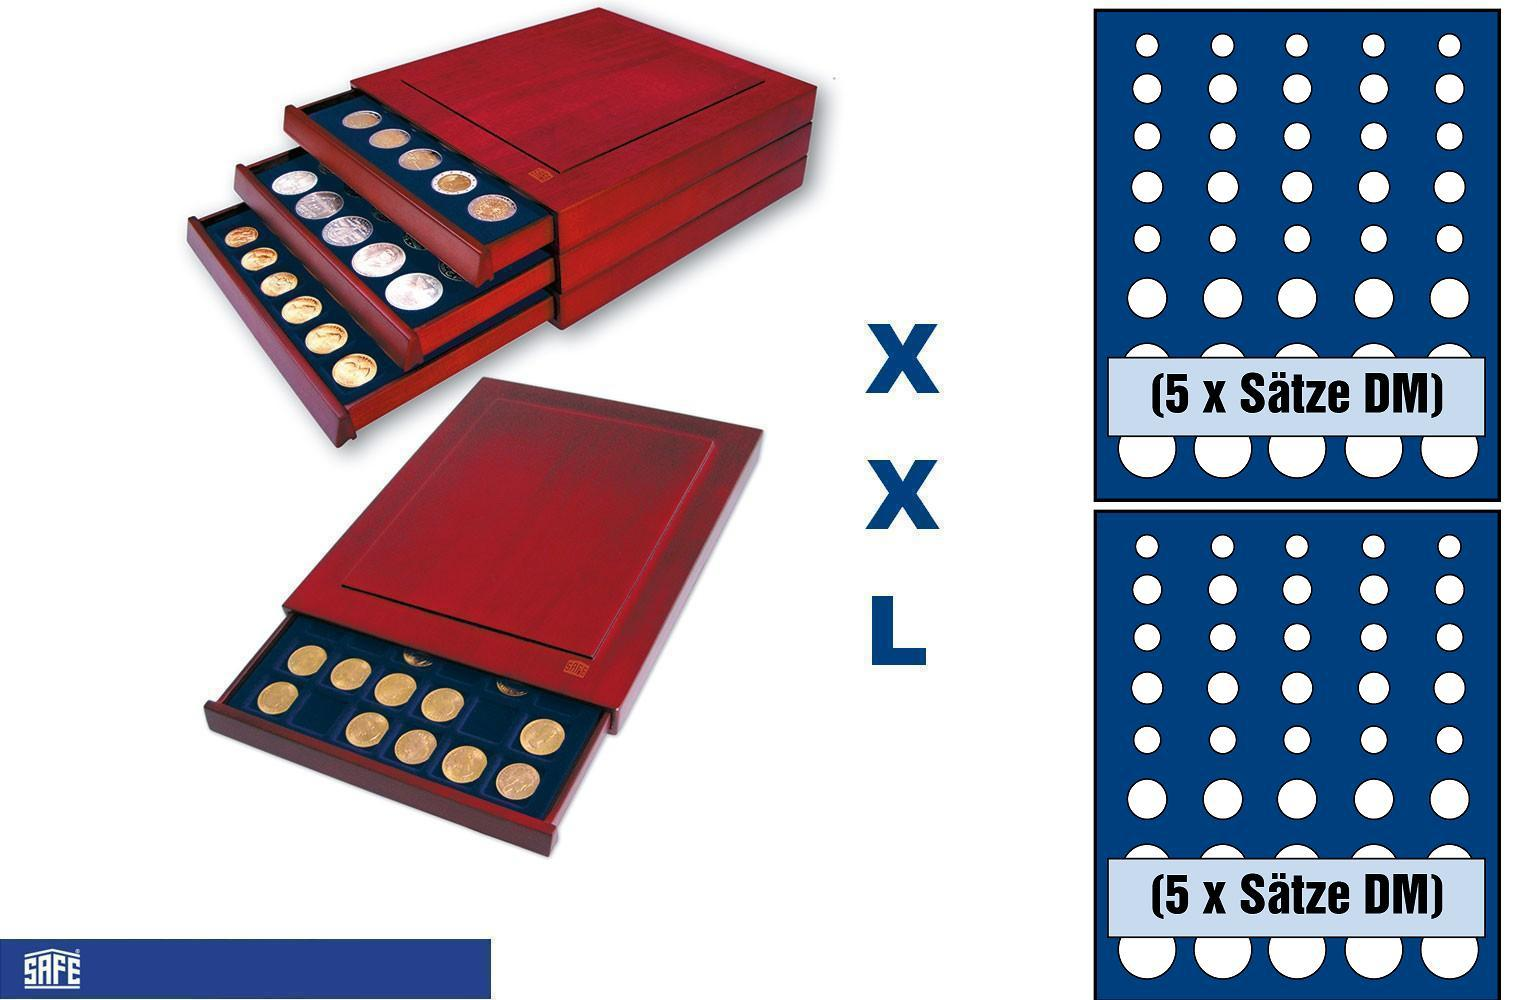 safe 6844 xxl nova exquisite holz münzboxen